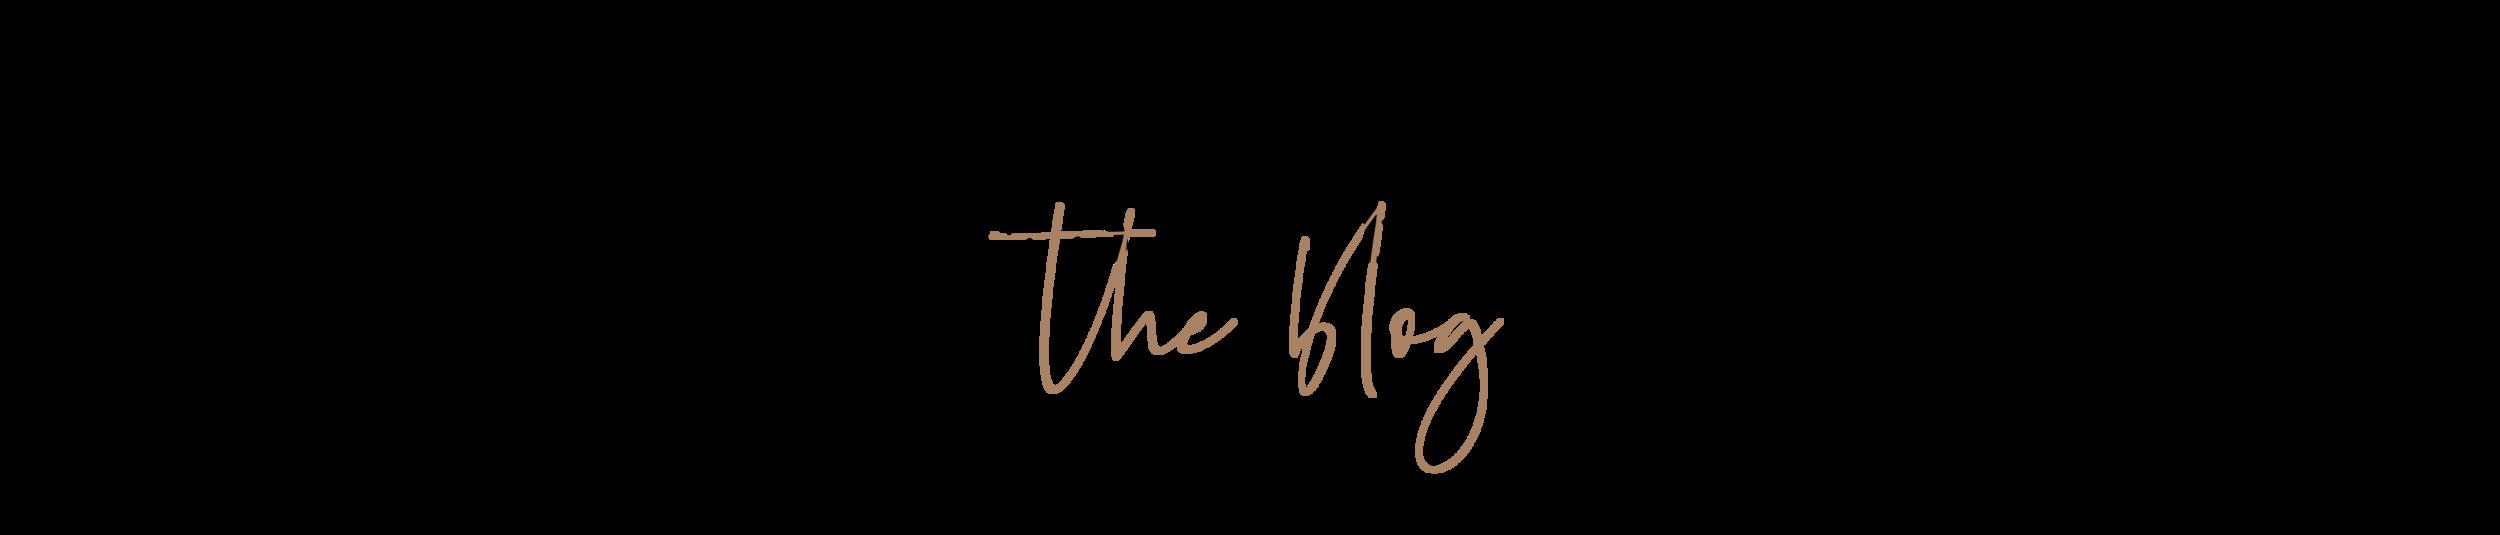 blog1@3x.png